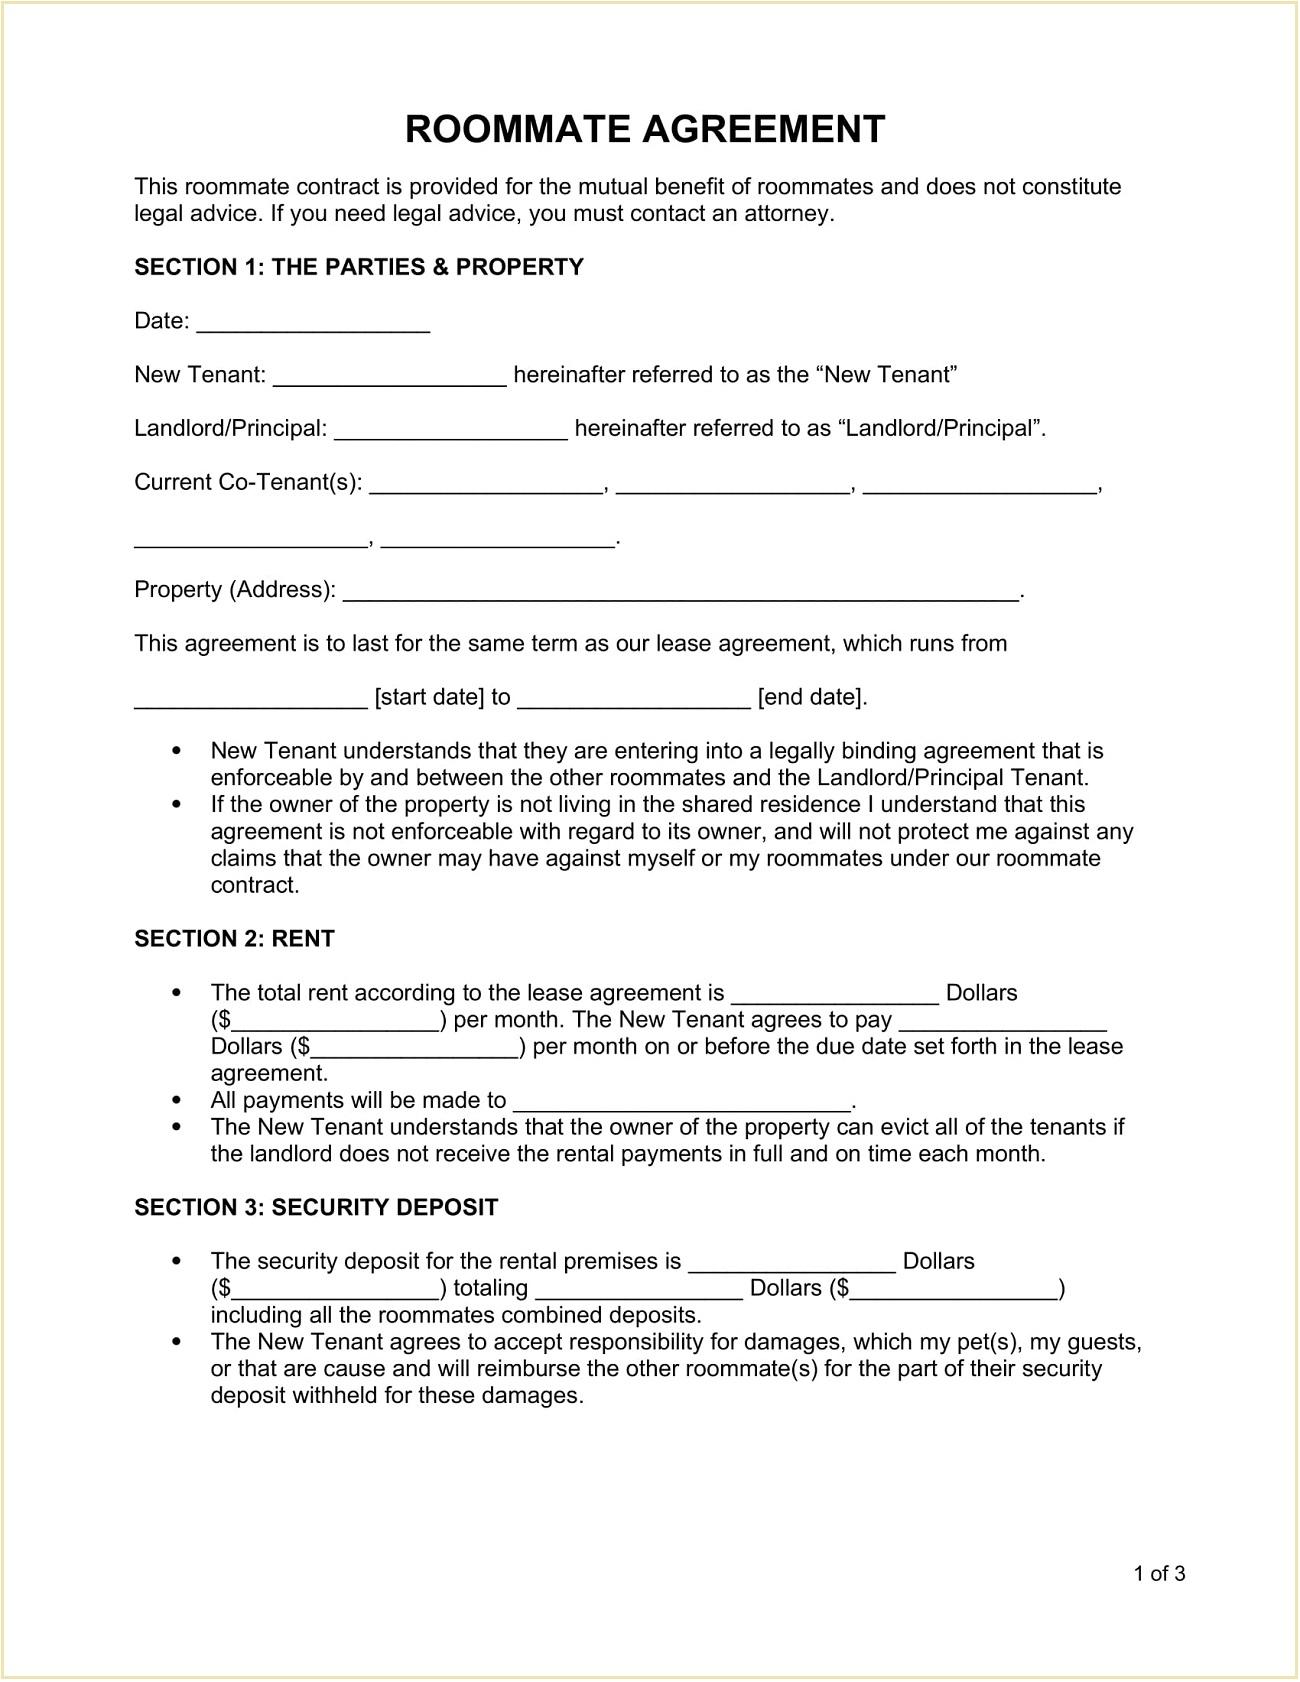 Roommate Room Rental Agreement Form Template Word